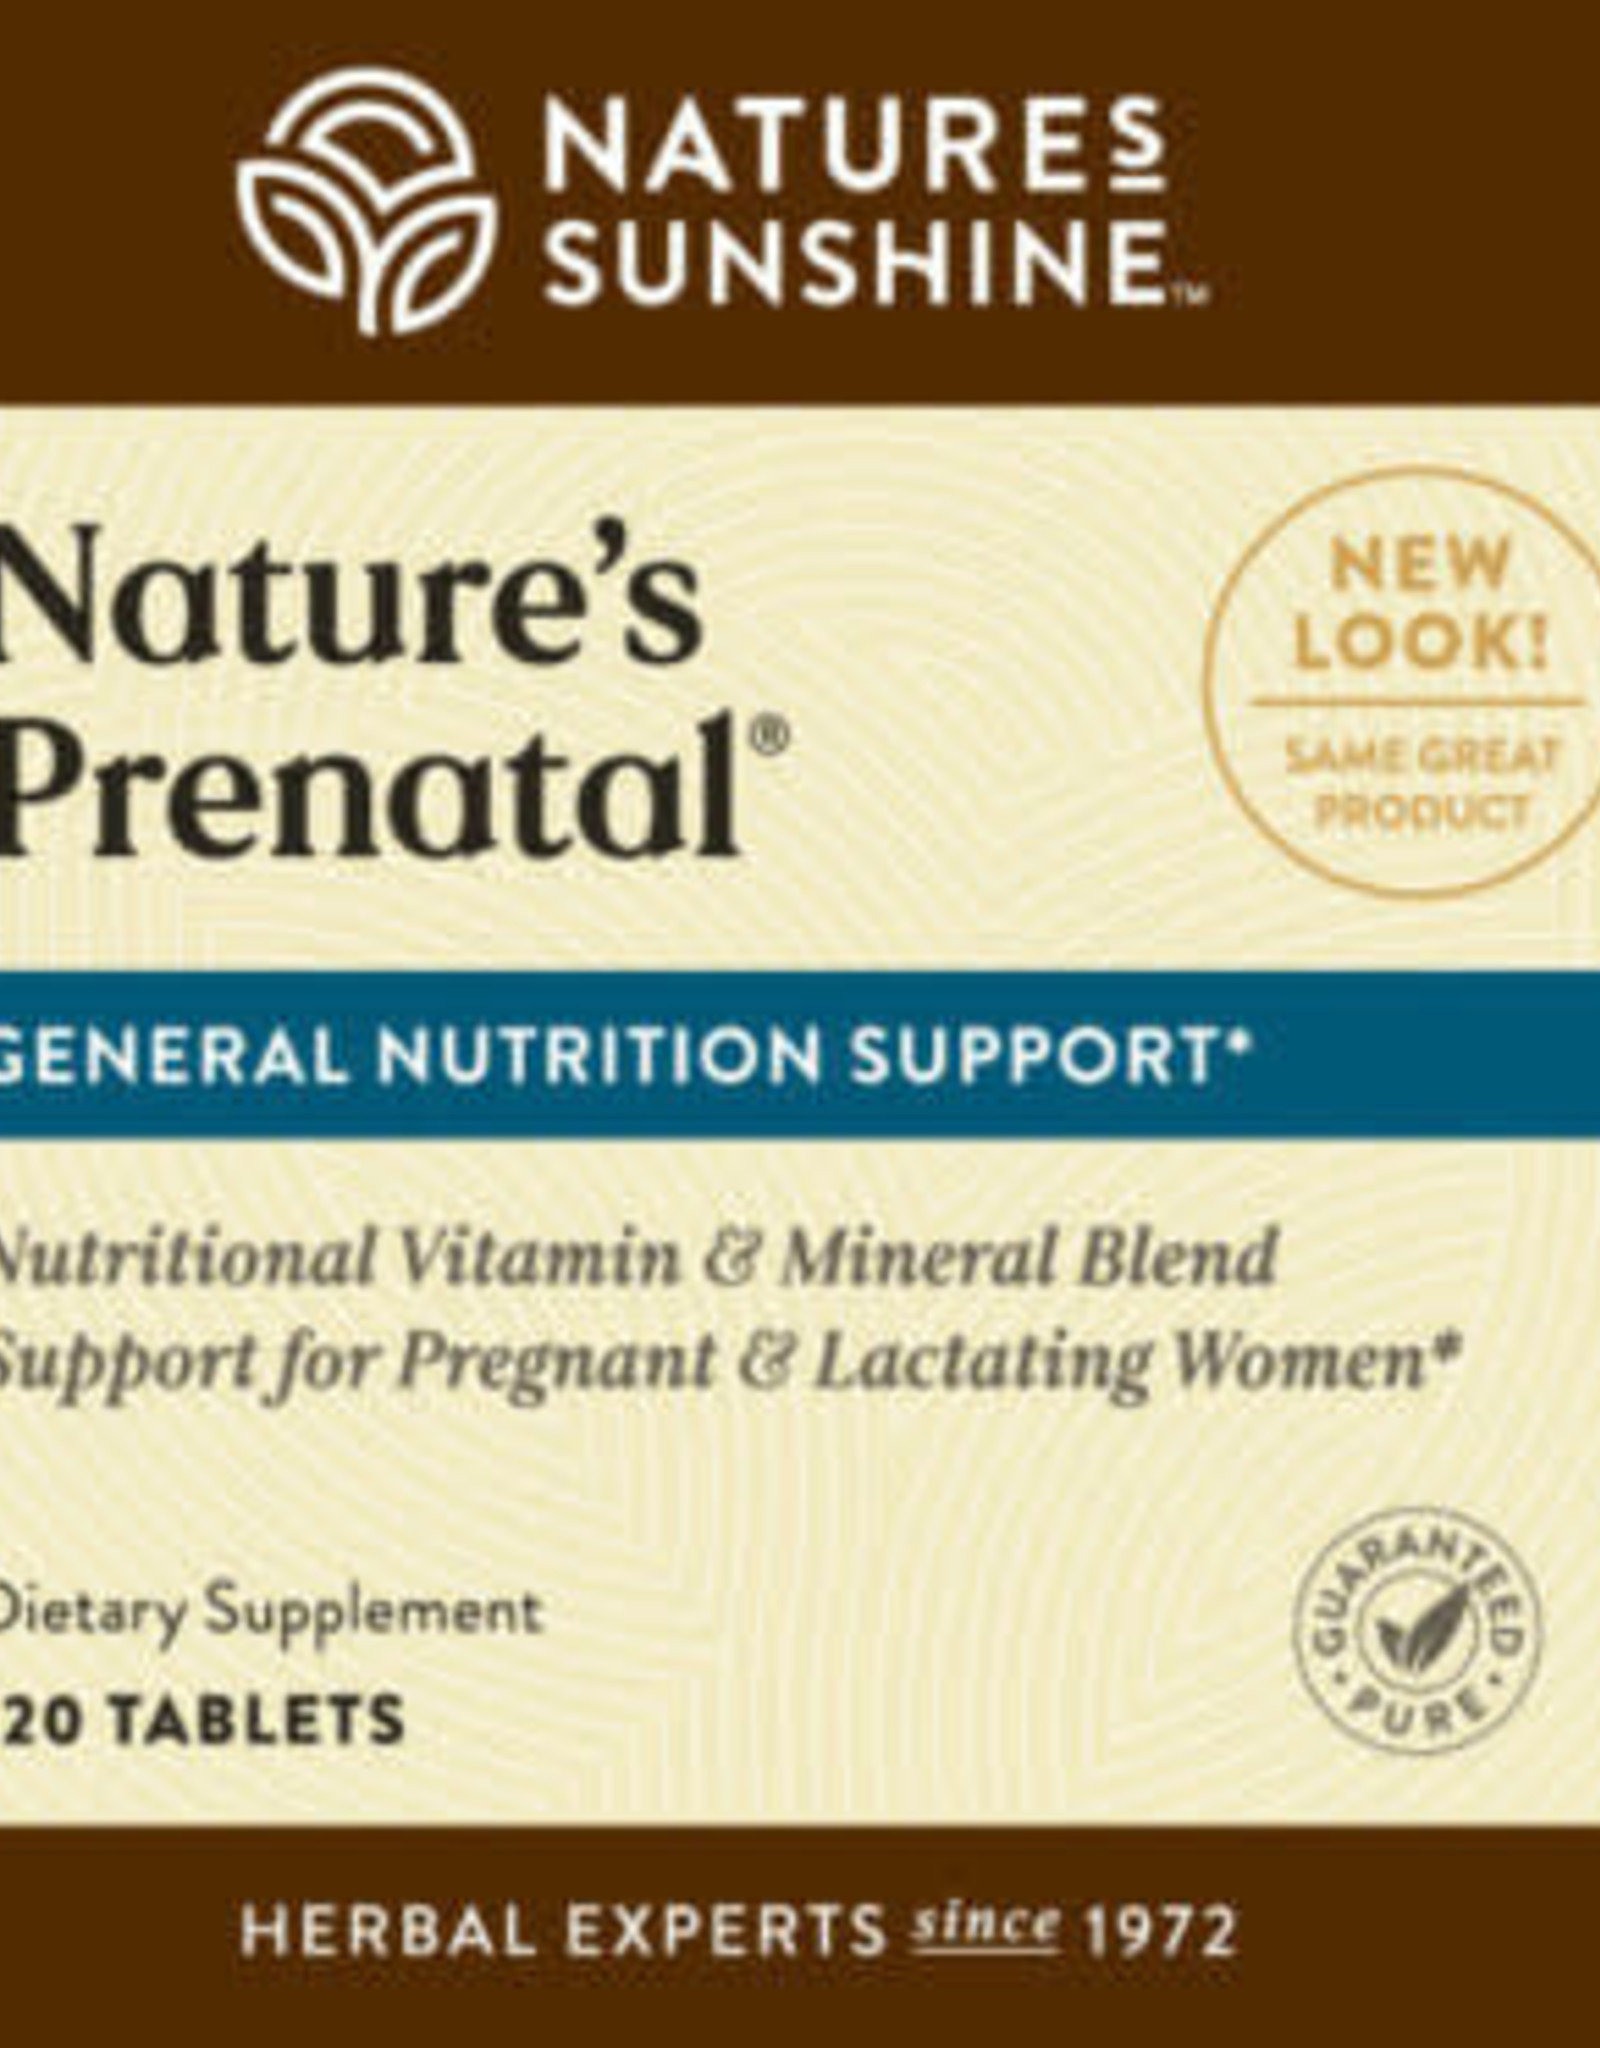 Nature's Sunshine Nature's Prenatal (120 tabs)